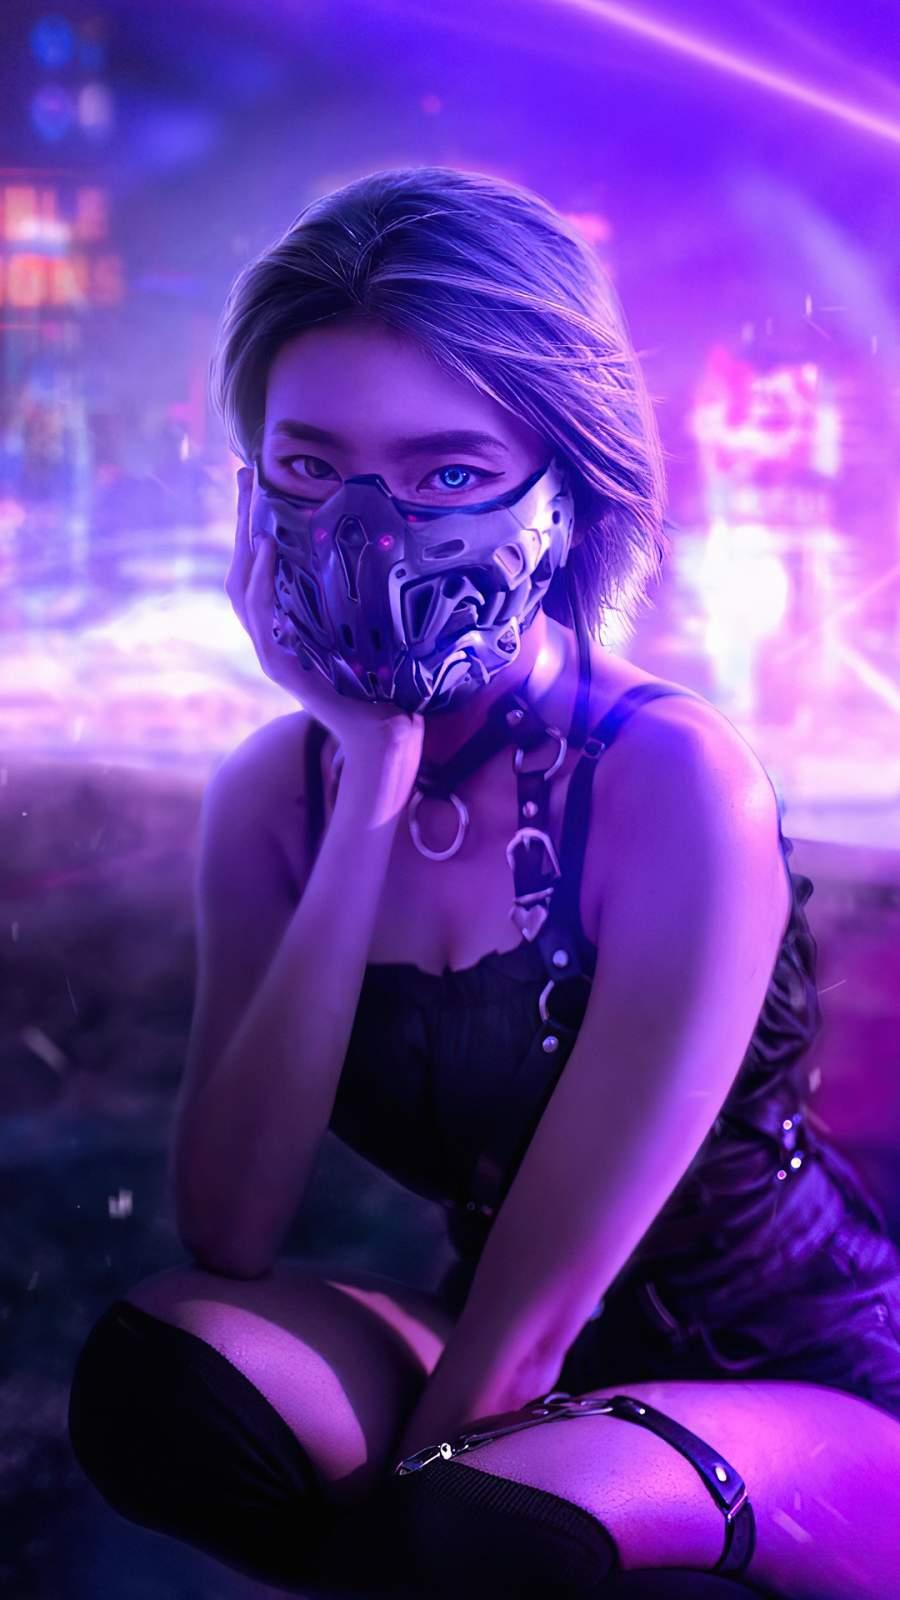 Cyberpunk Girl Mask